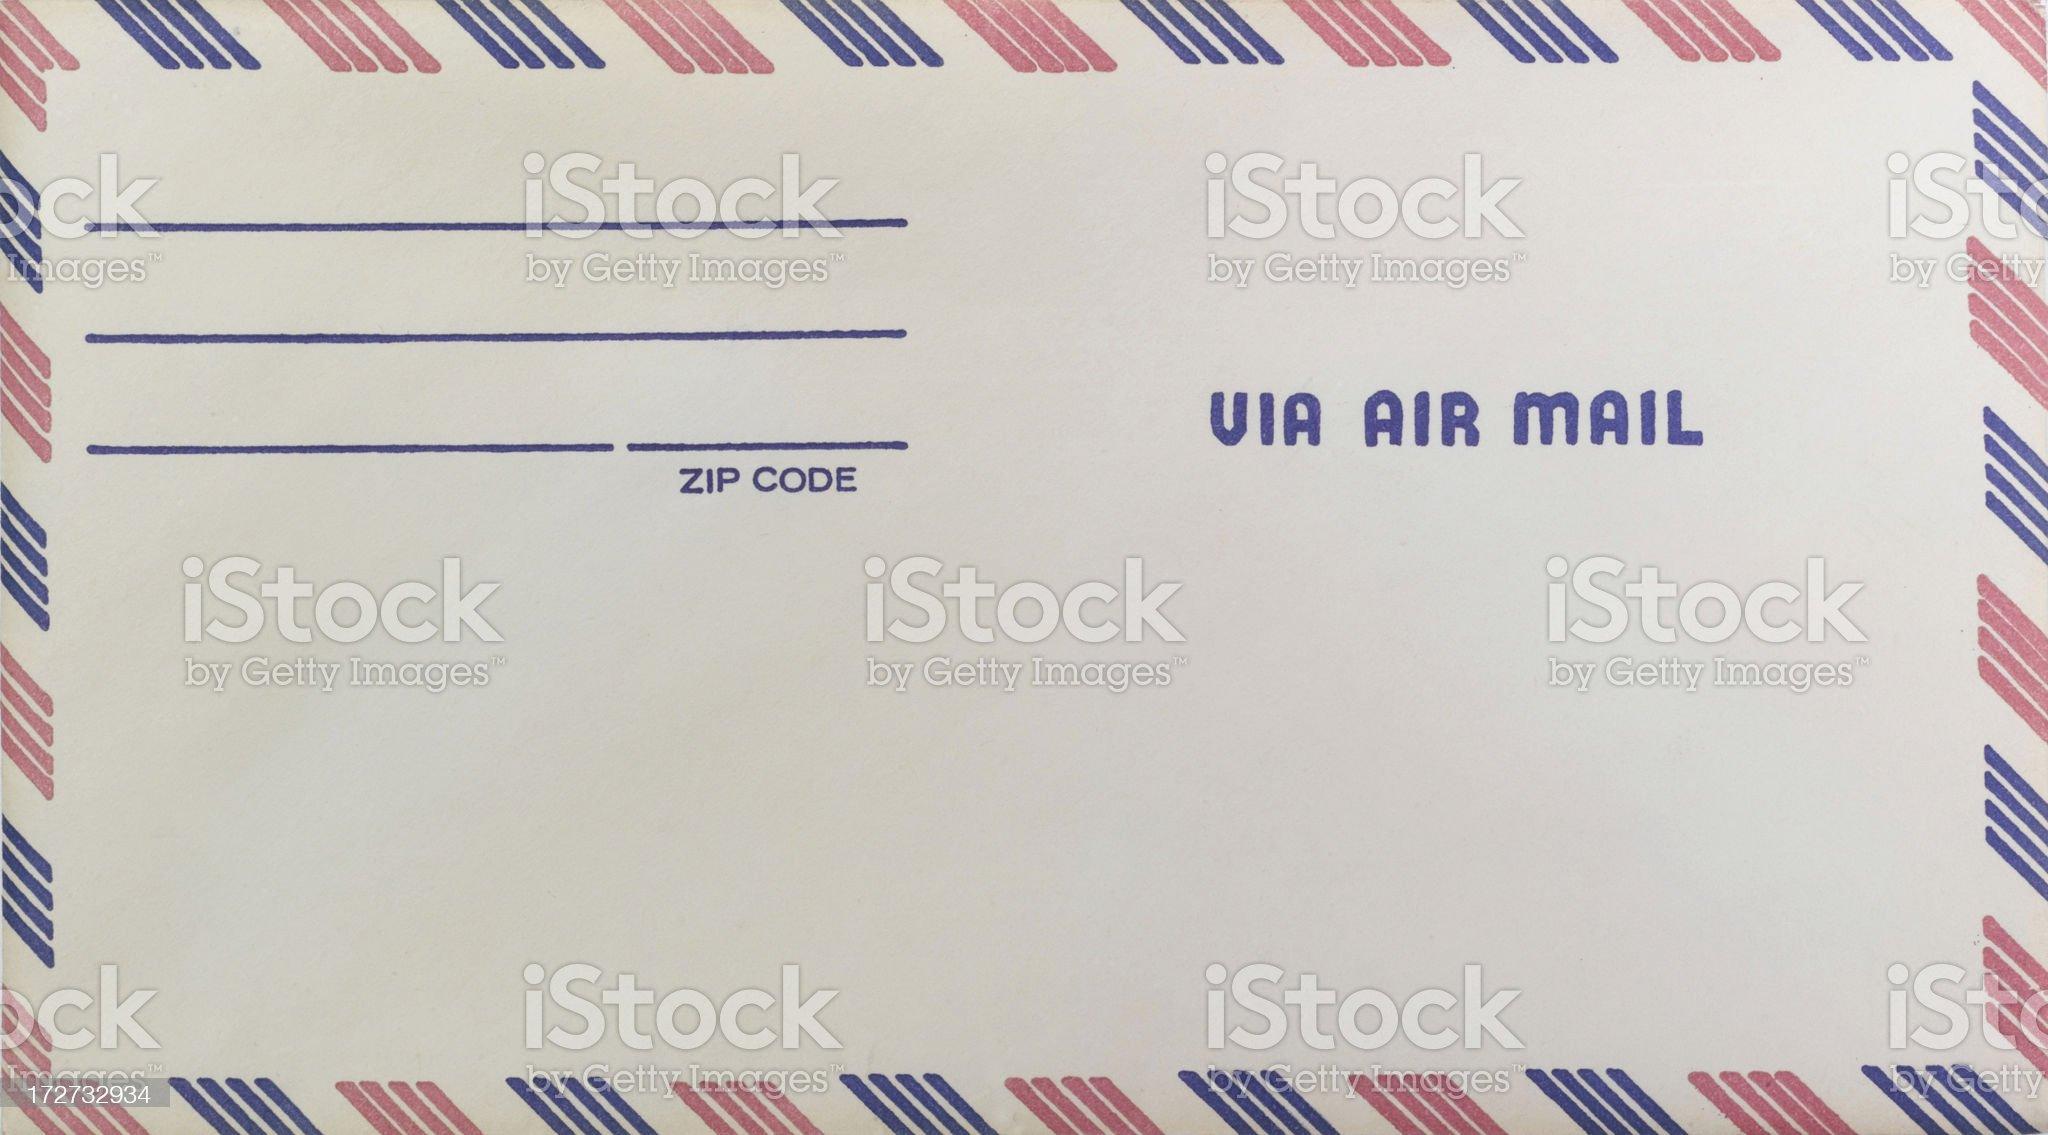 Via Air Mail royalty-free stock photo